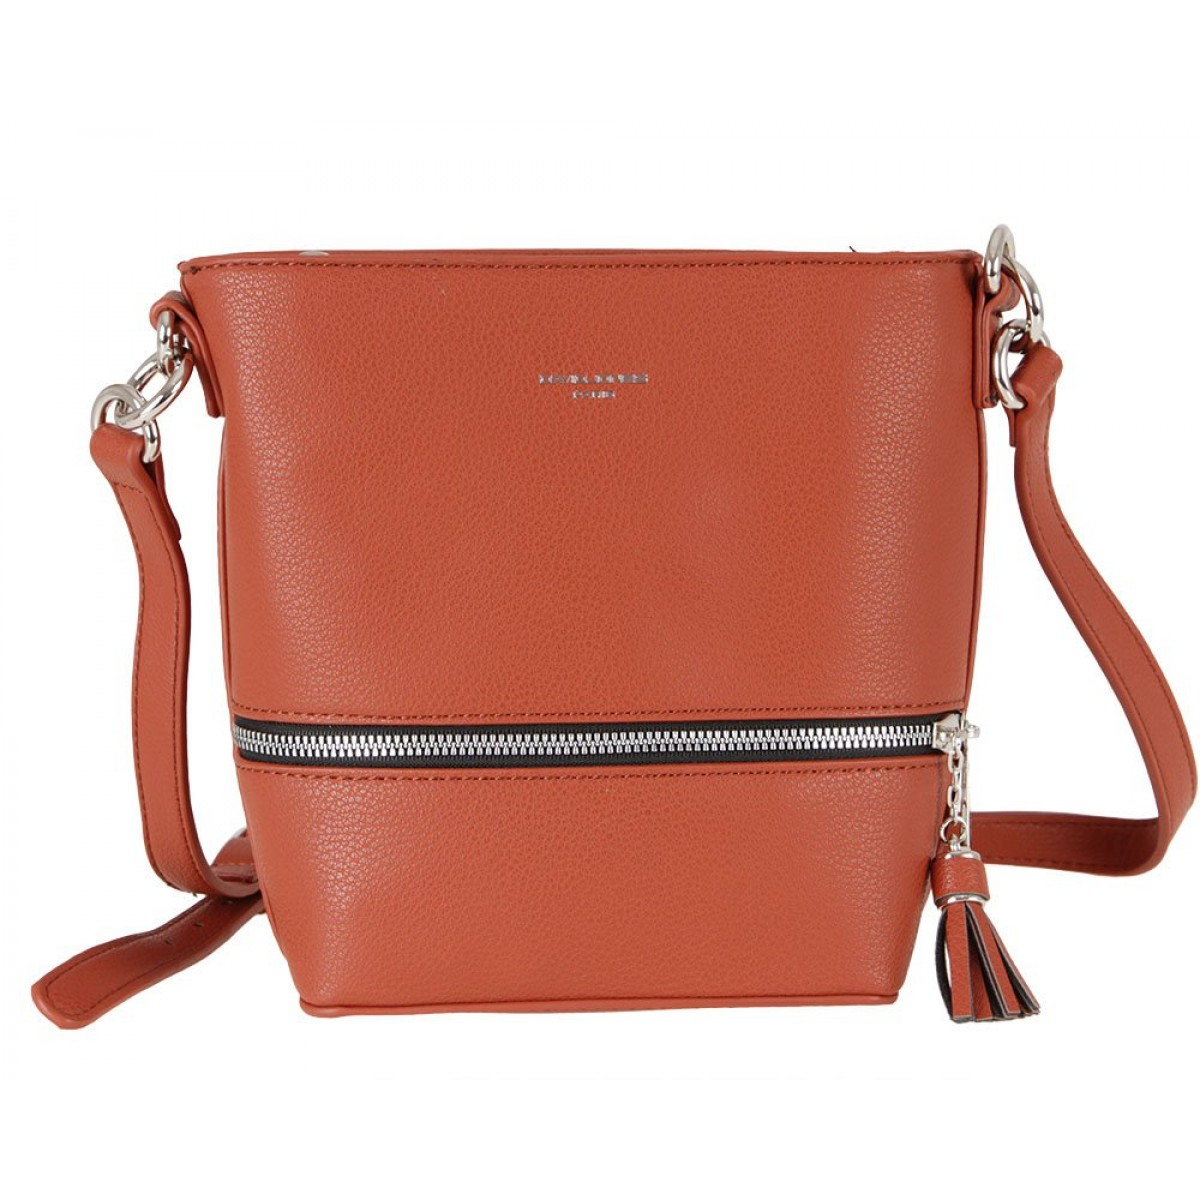 Жіноча сумка David Jones 6402-1 SIENNA